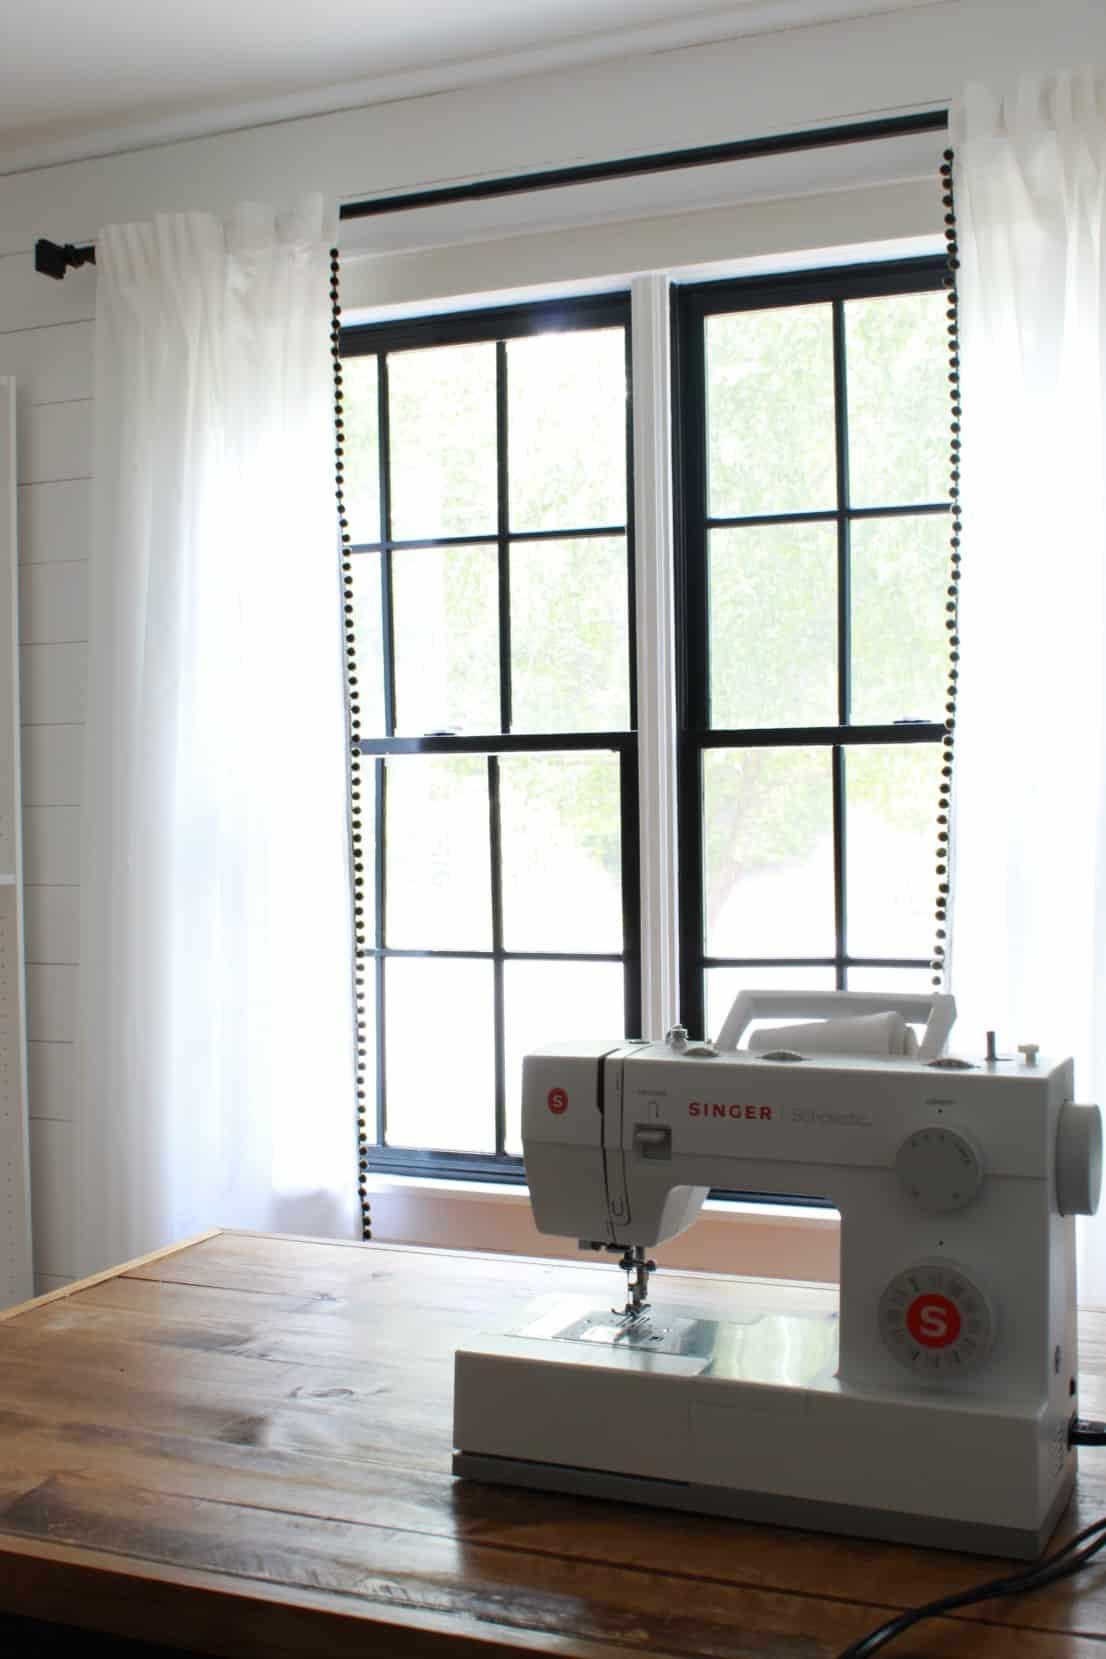 17 Images About Build Ikea Panel Curtain On Pinterest: DIY Farmhouse Ikea Curtains